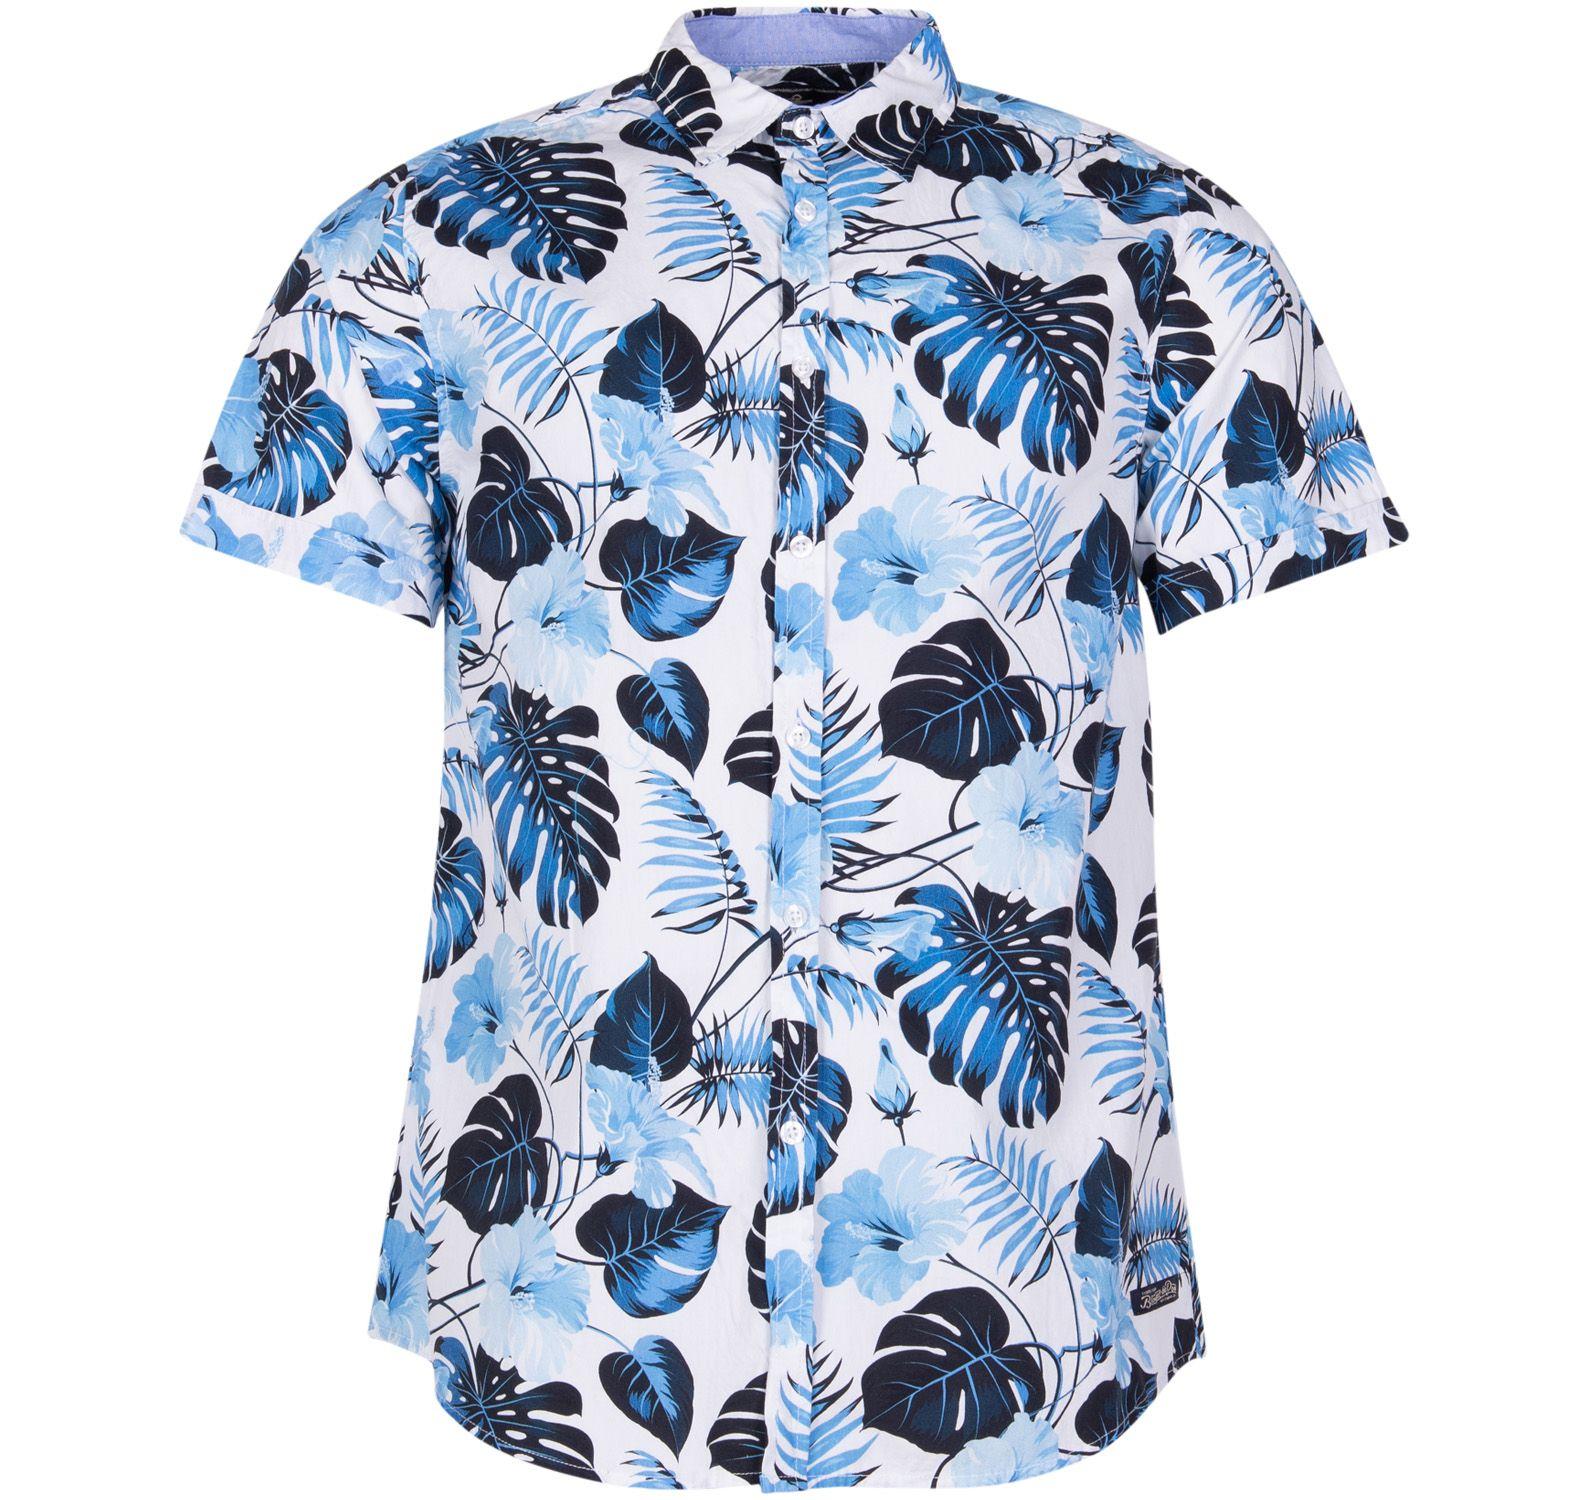 hawaii monstrea shirt s/s, white, 2xl, pool